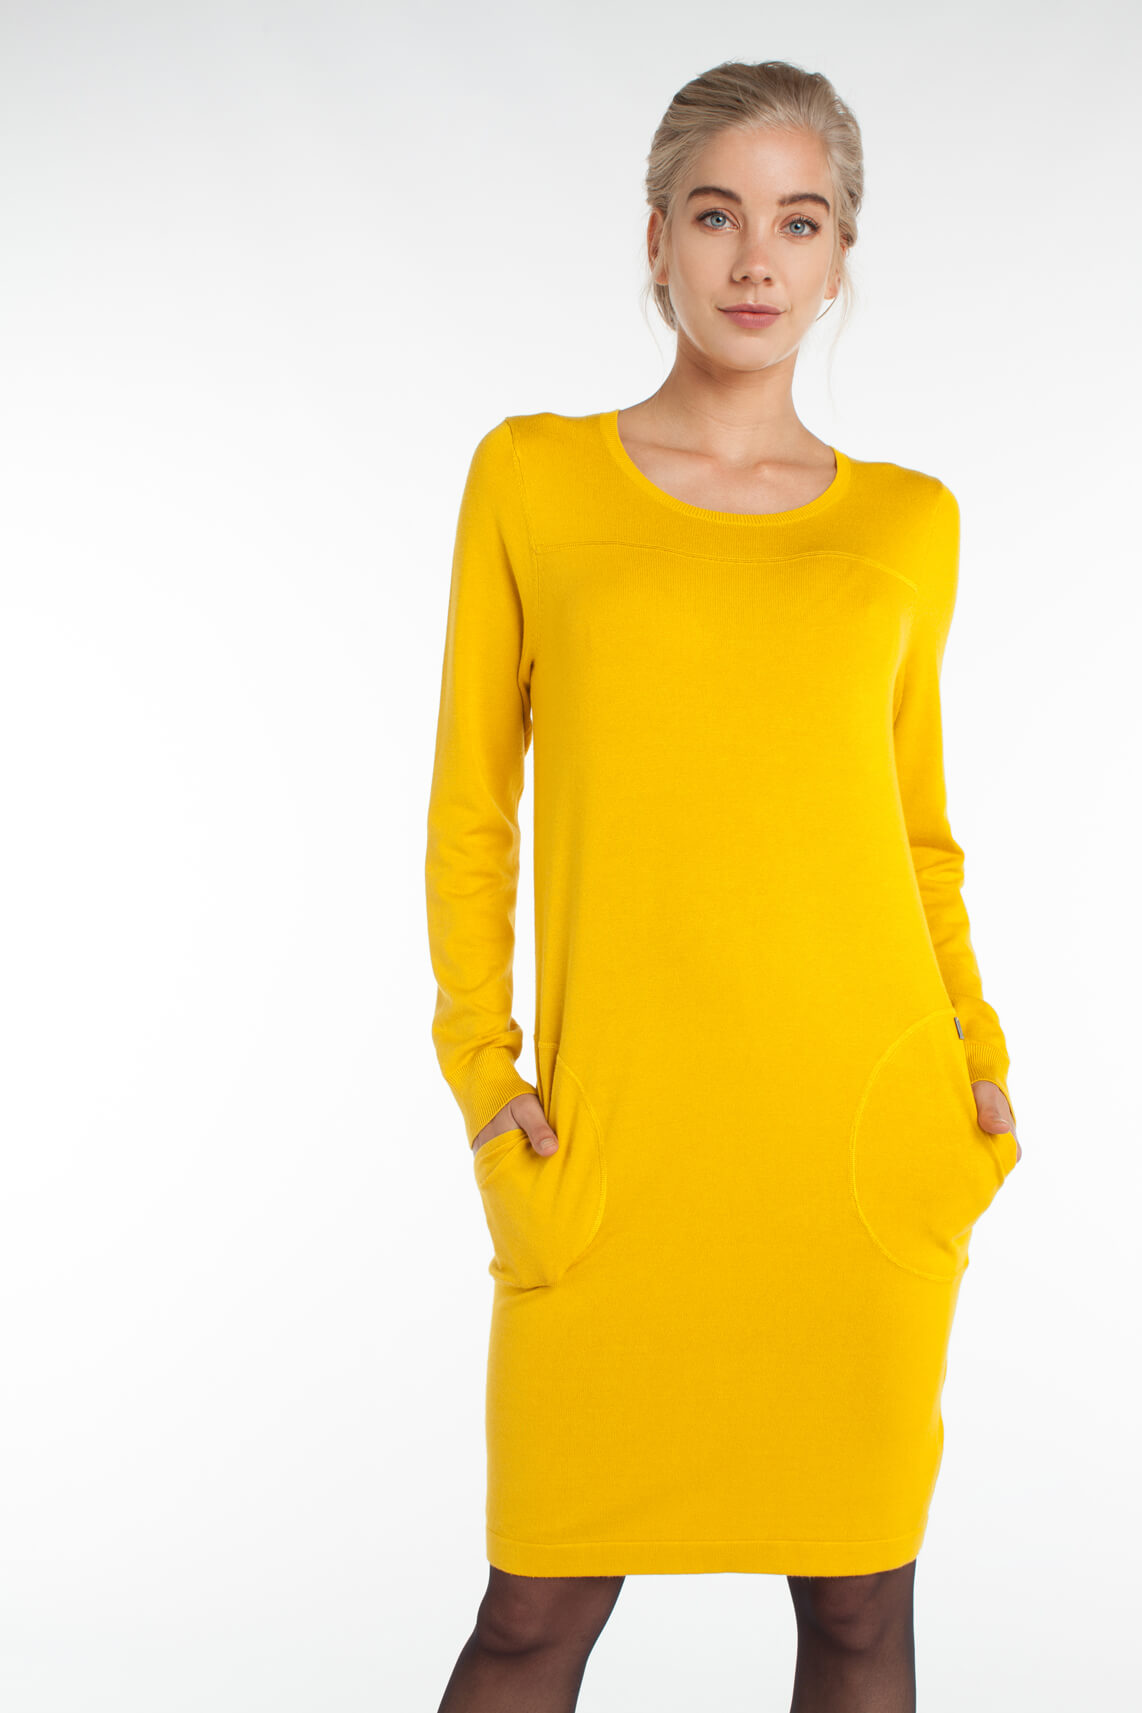 Anna Dames Fijngebreide jurk geel